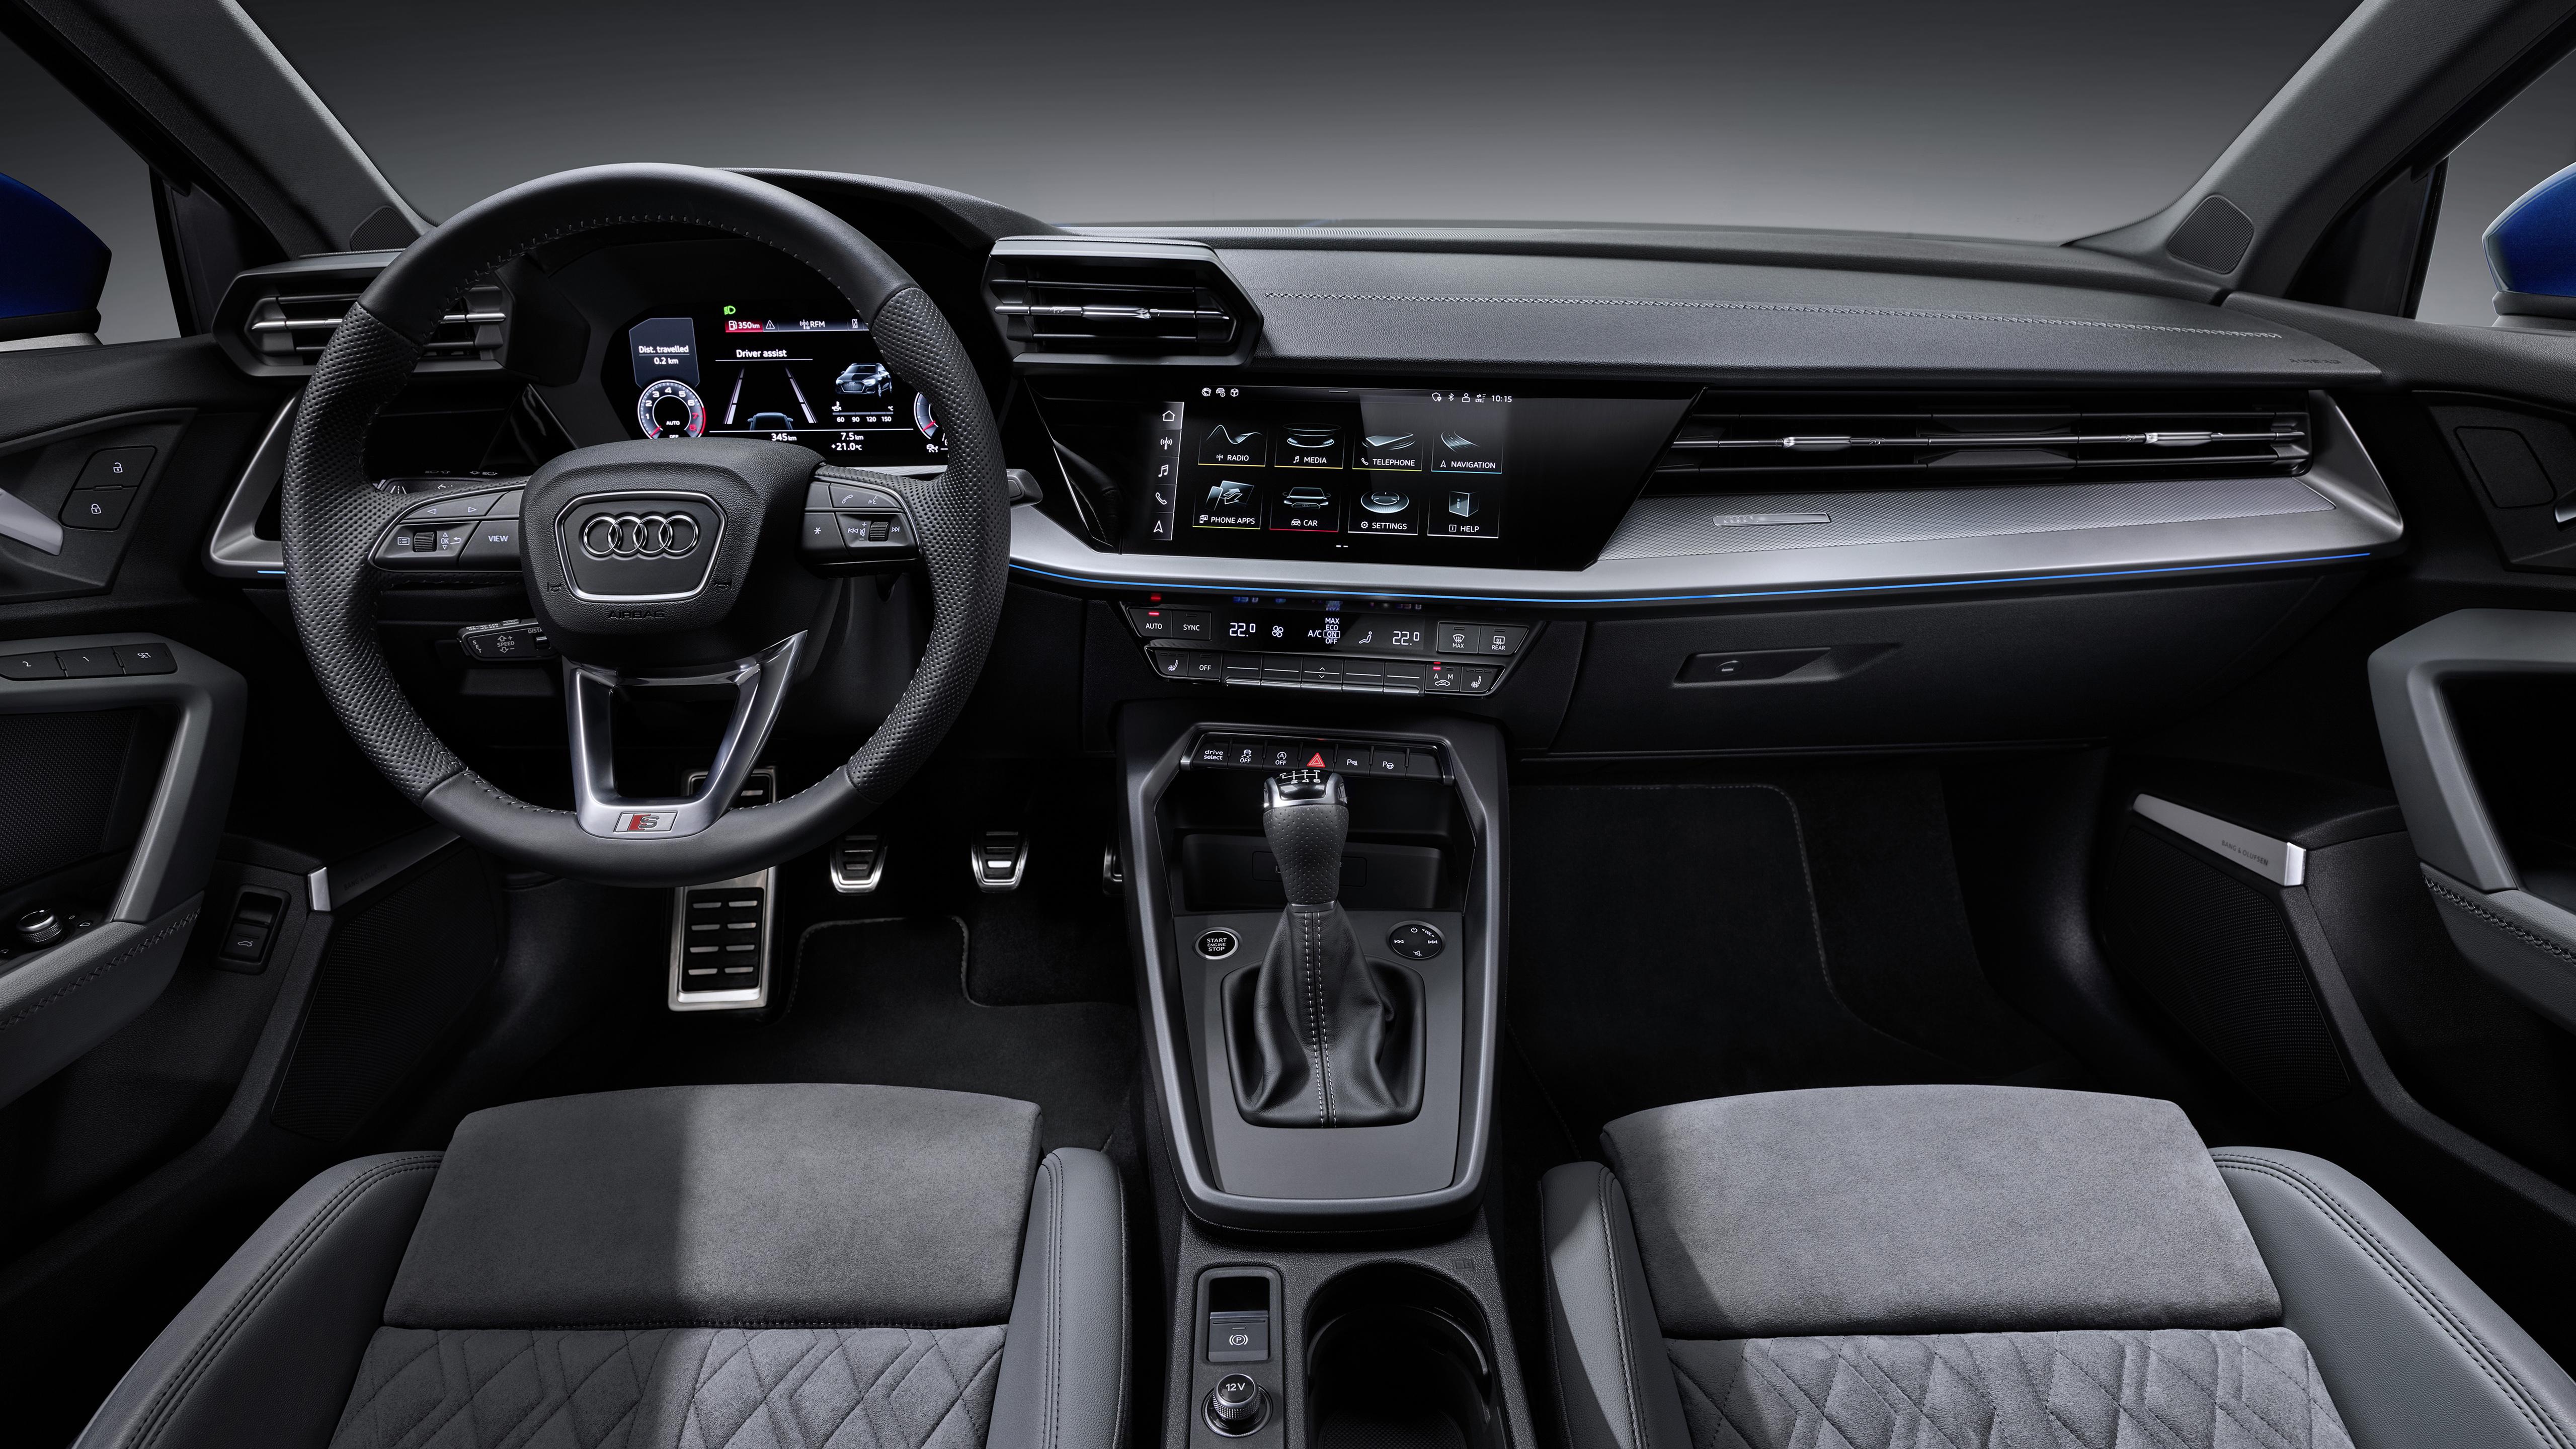 Audi A3 Sportback 35 Tfsi 2020 4k Interior Wallpaper Hd Car Wallpapers Id 14463